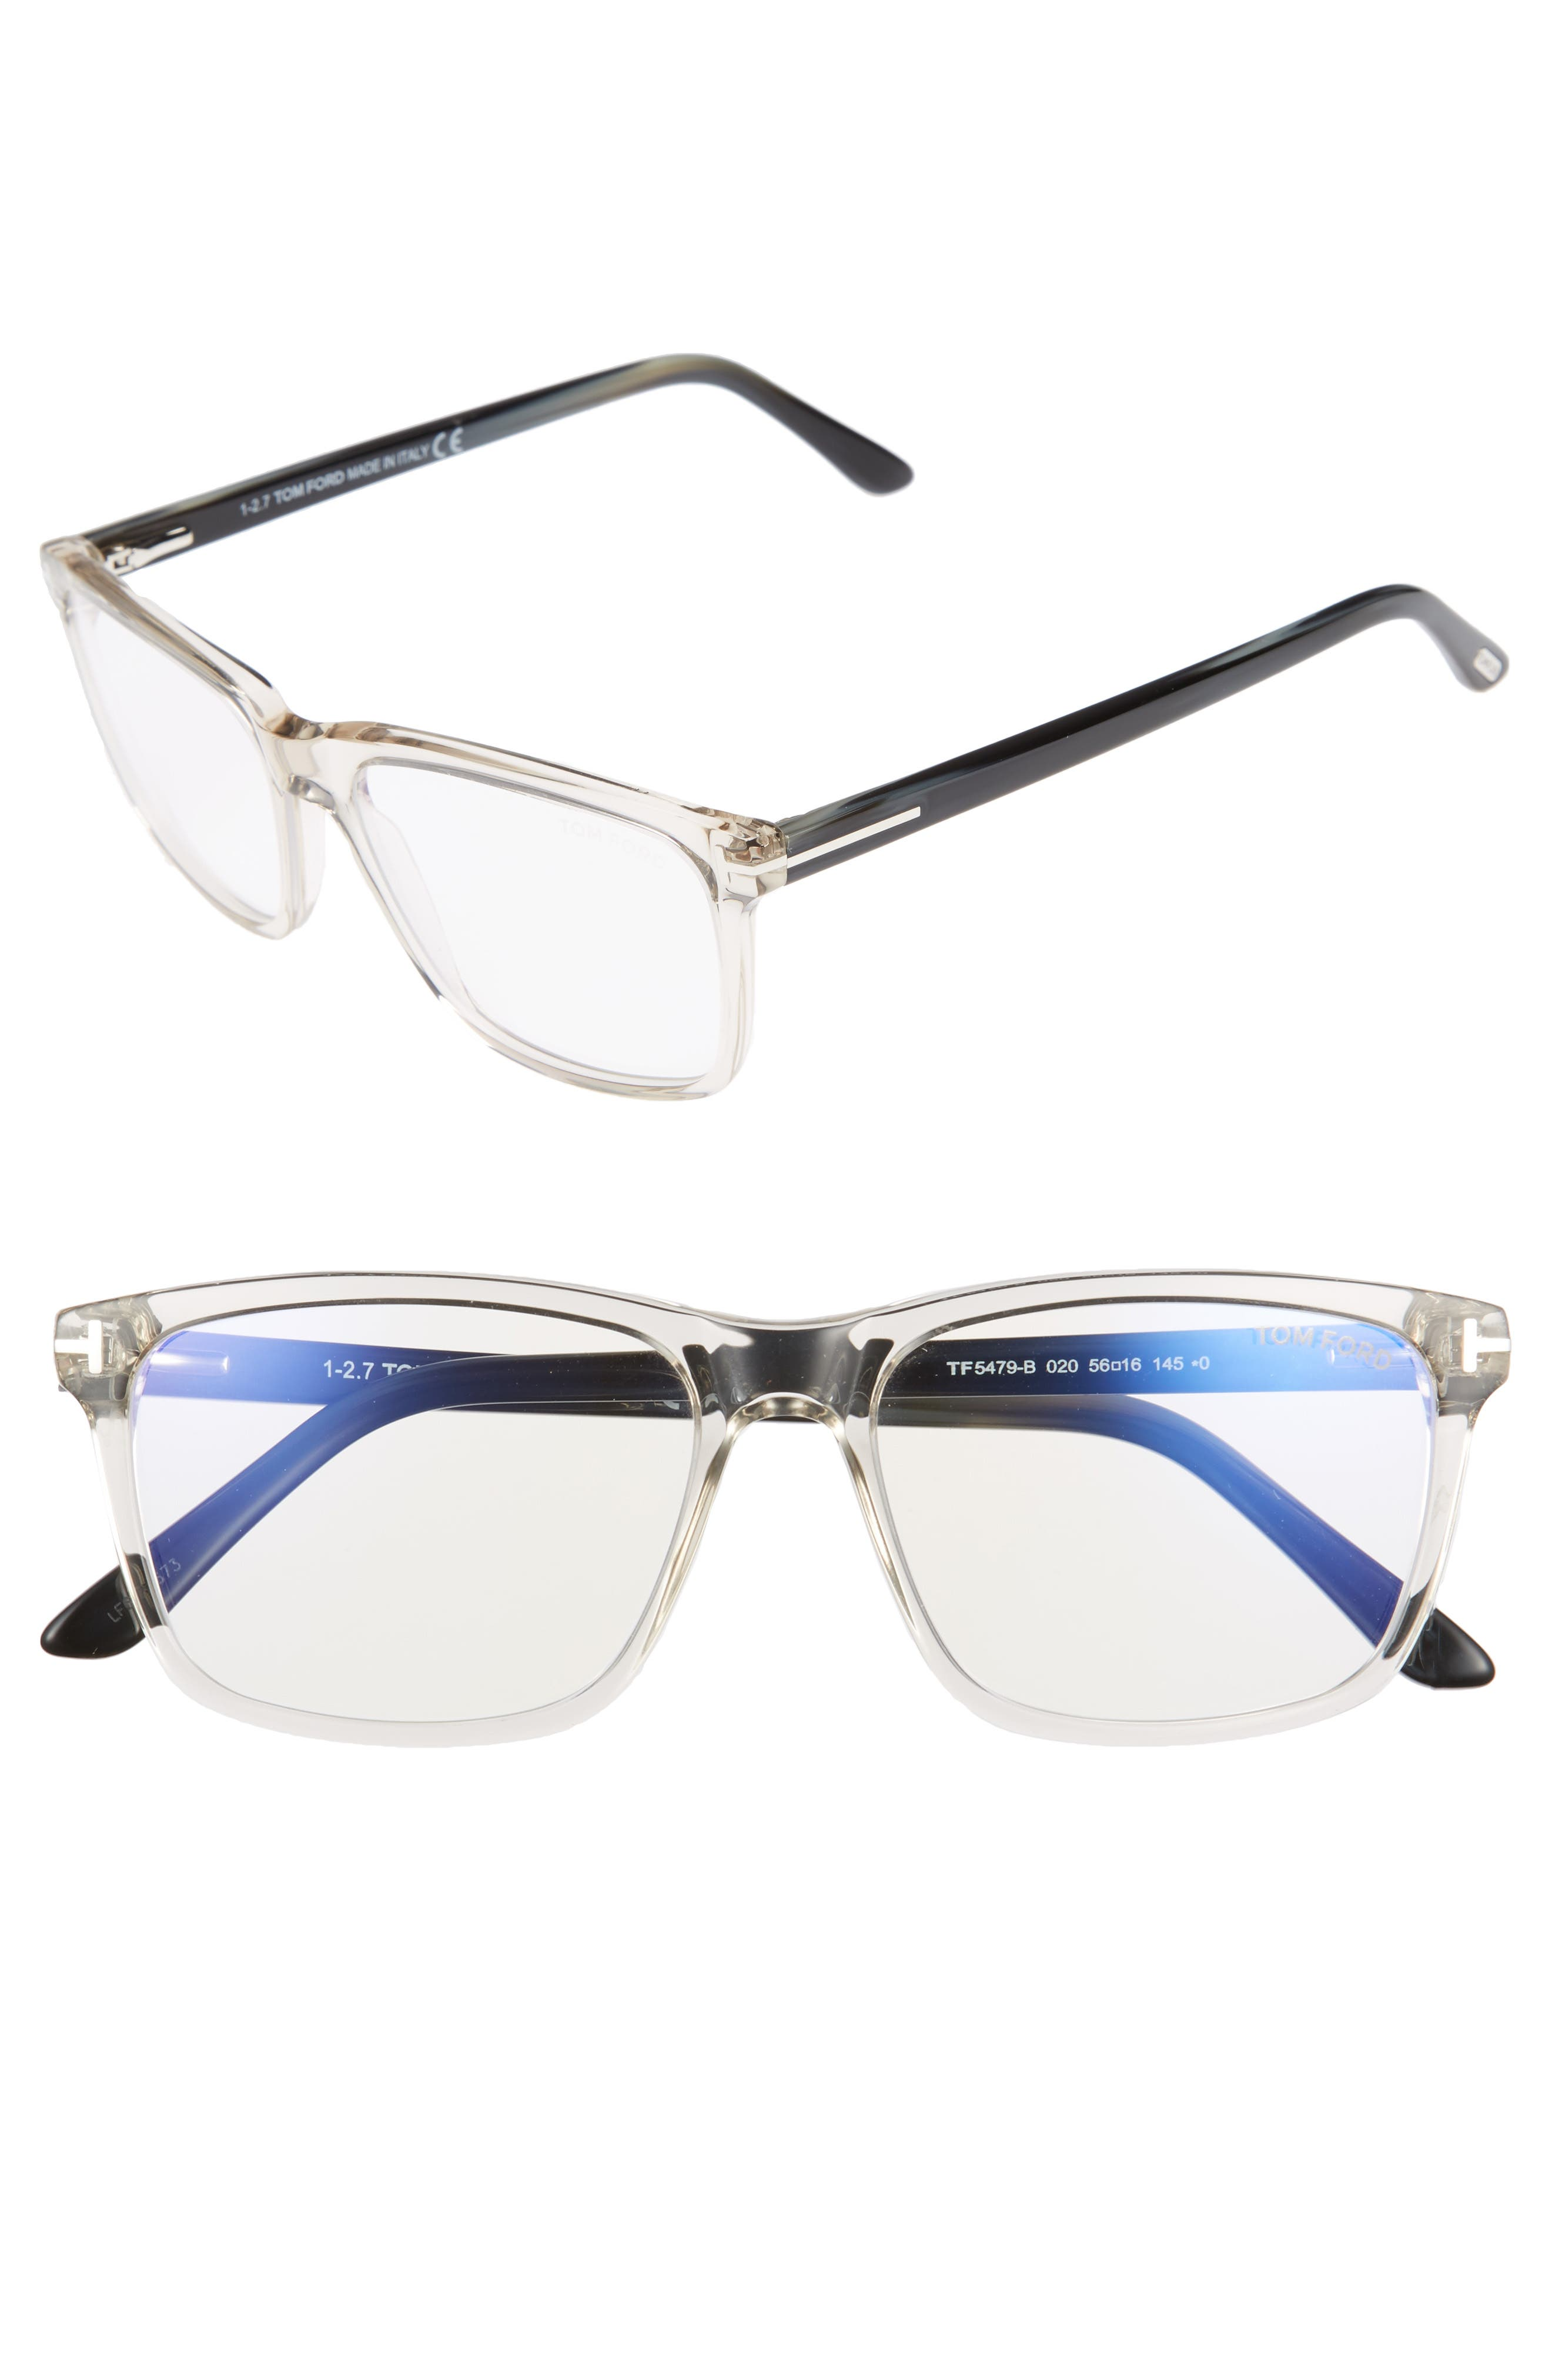 Tom Ford 56mm Blue Block Optical Glasses